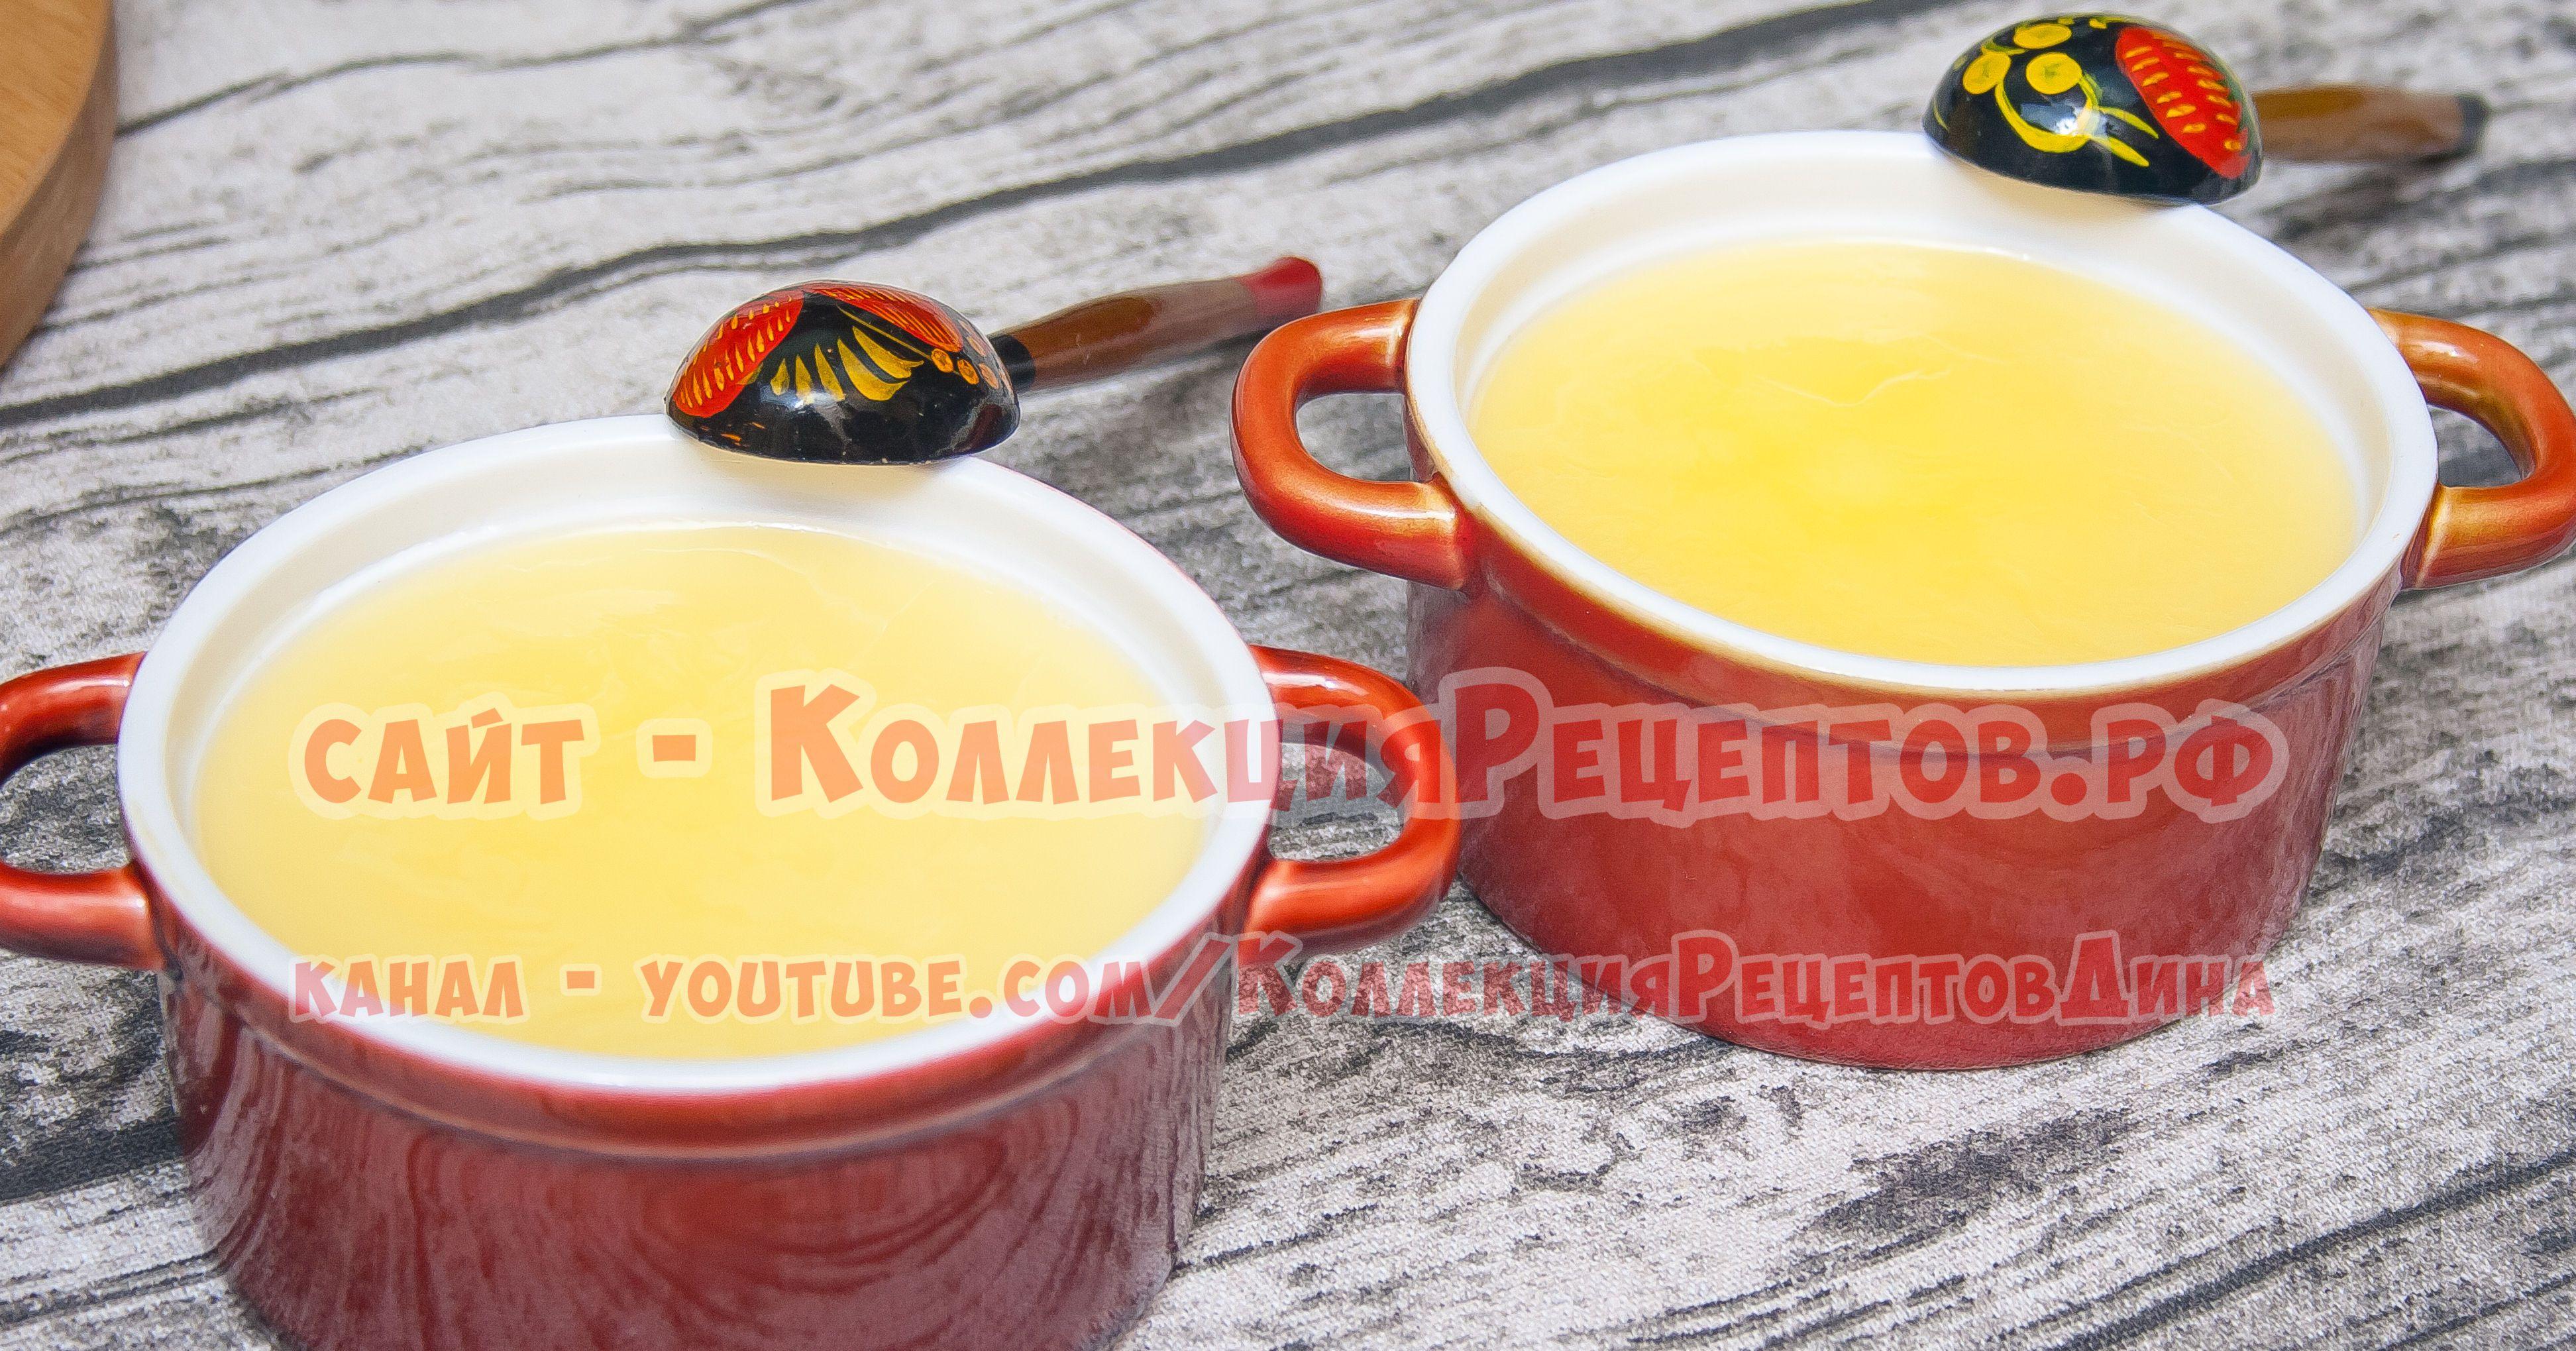 Топлёное масло в домашних условиях фото 445